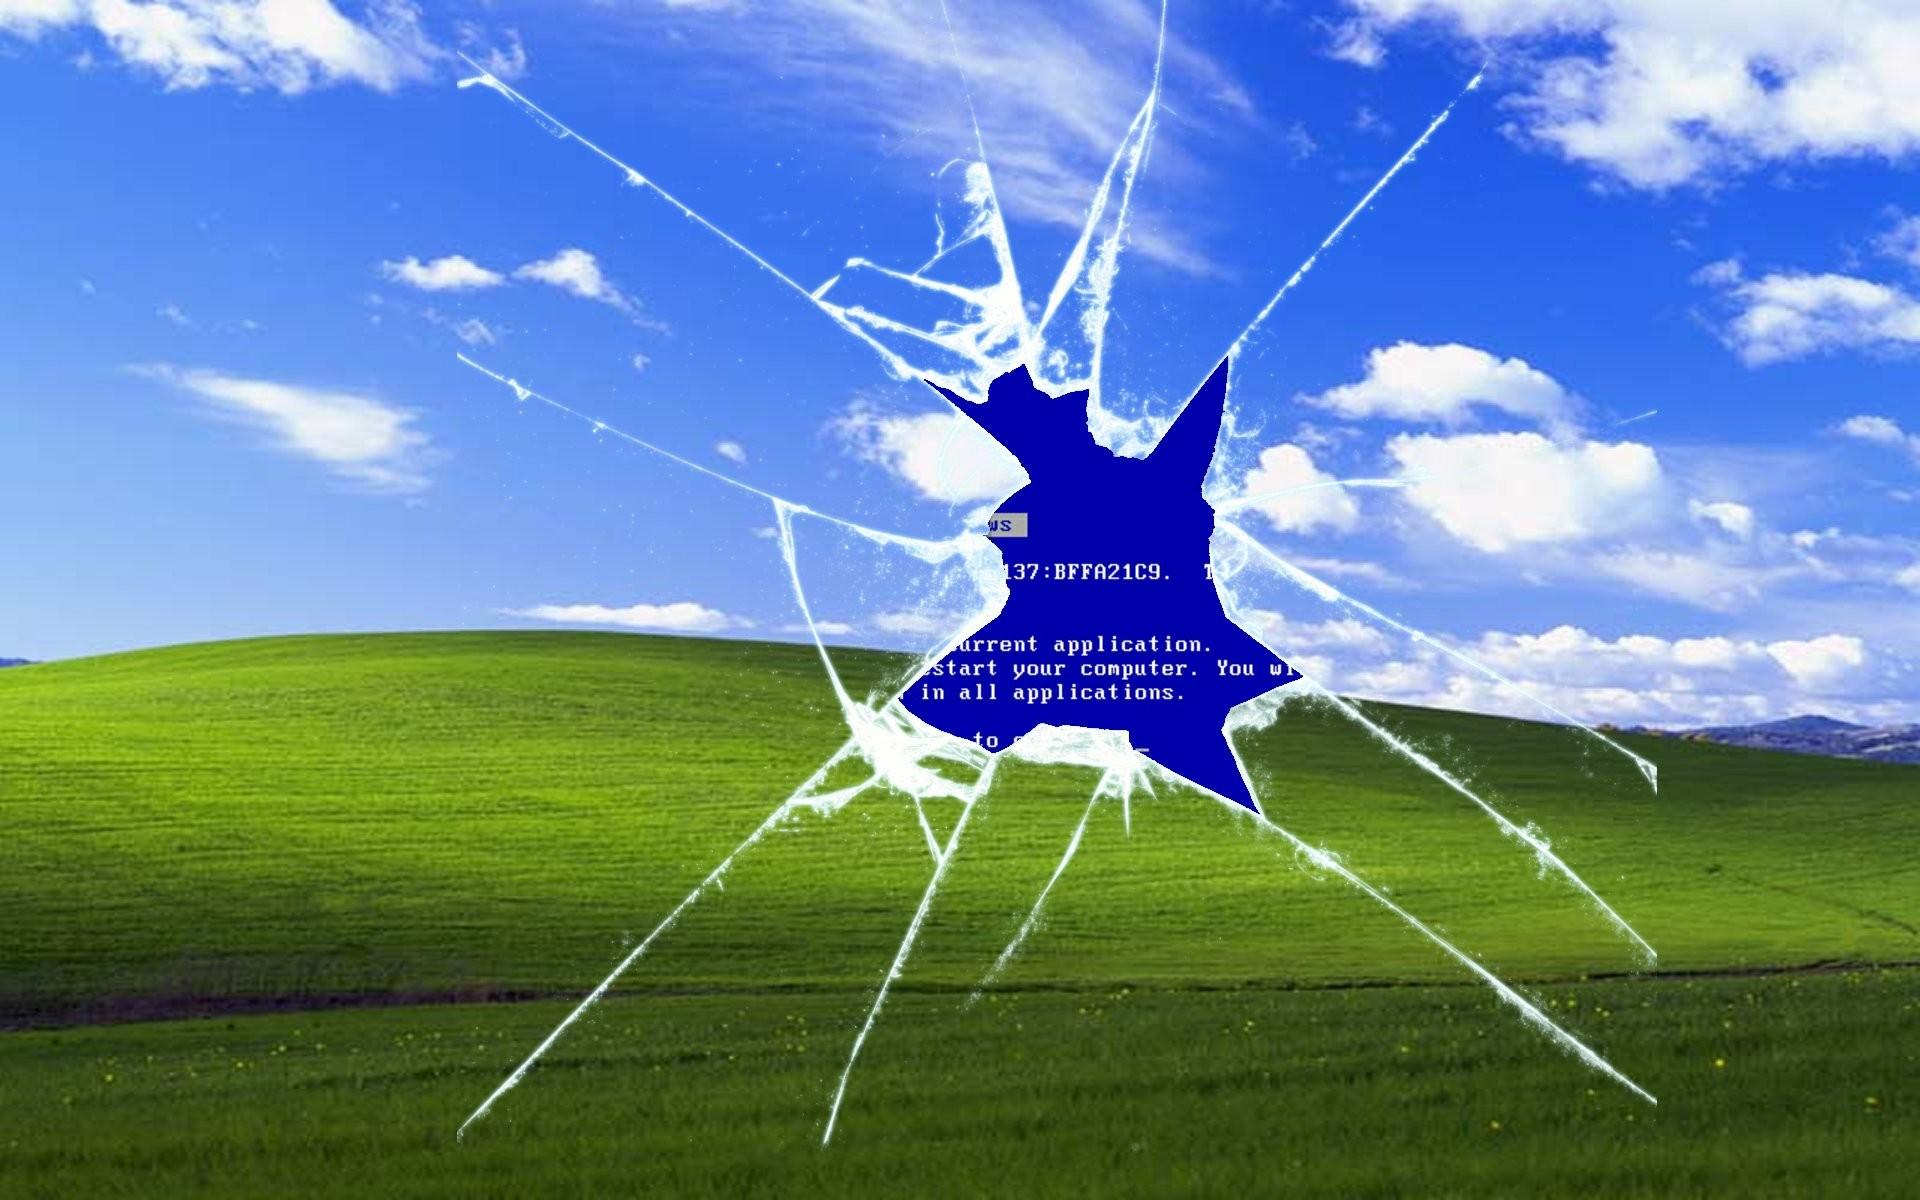 Lufthansa Hired Photographer Who Shot Windows XP Wallpaper To Take